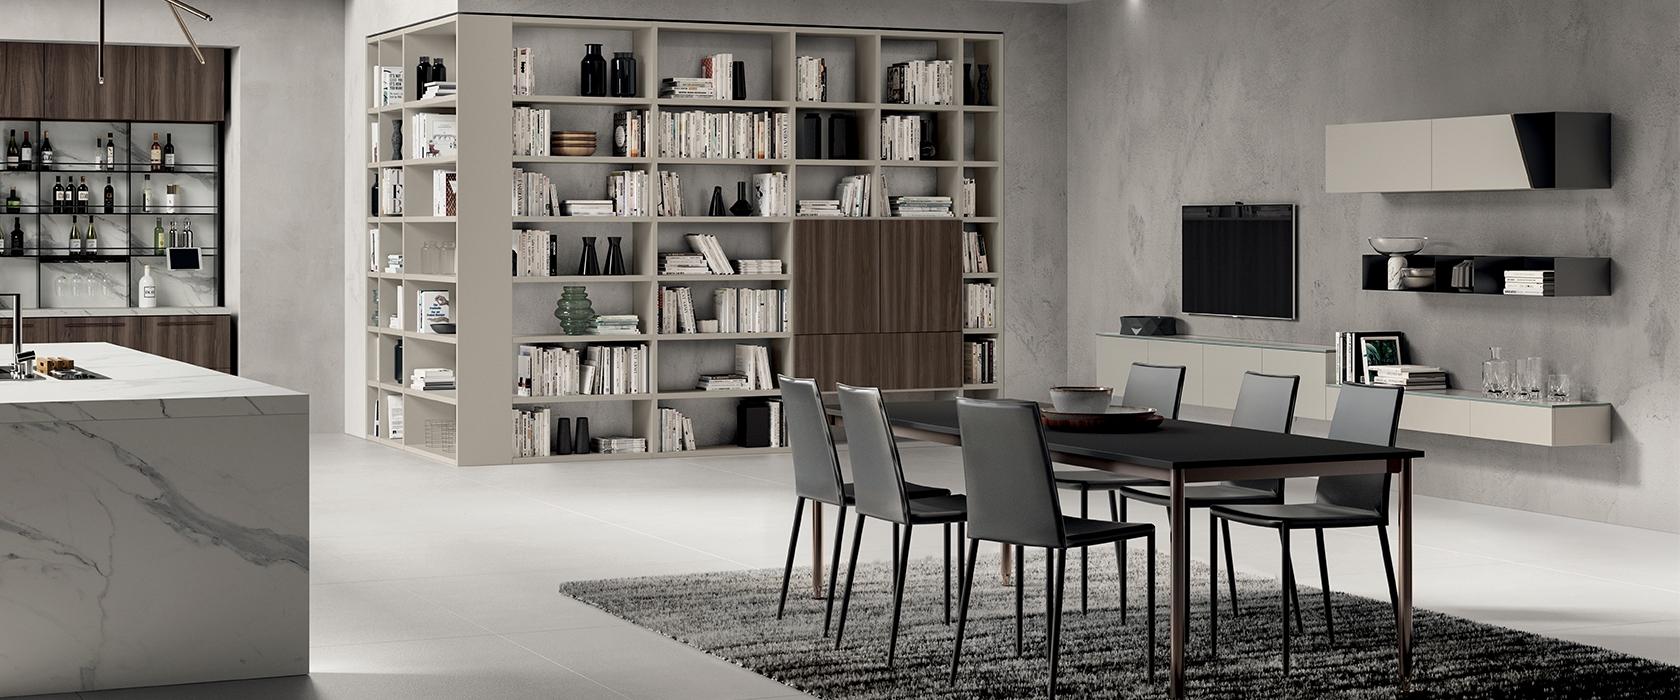 salon - sala de estar - living mood